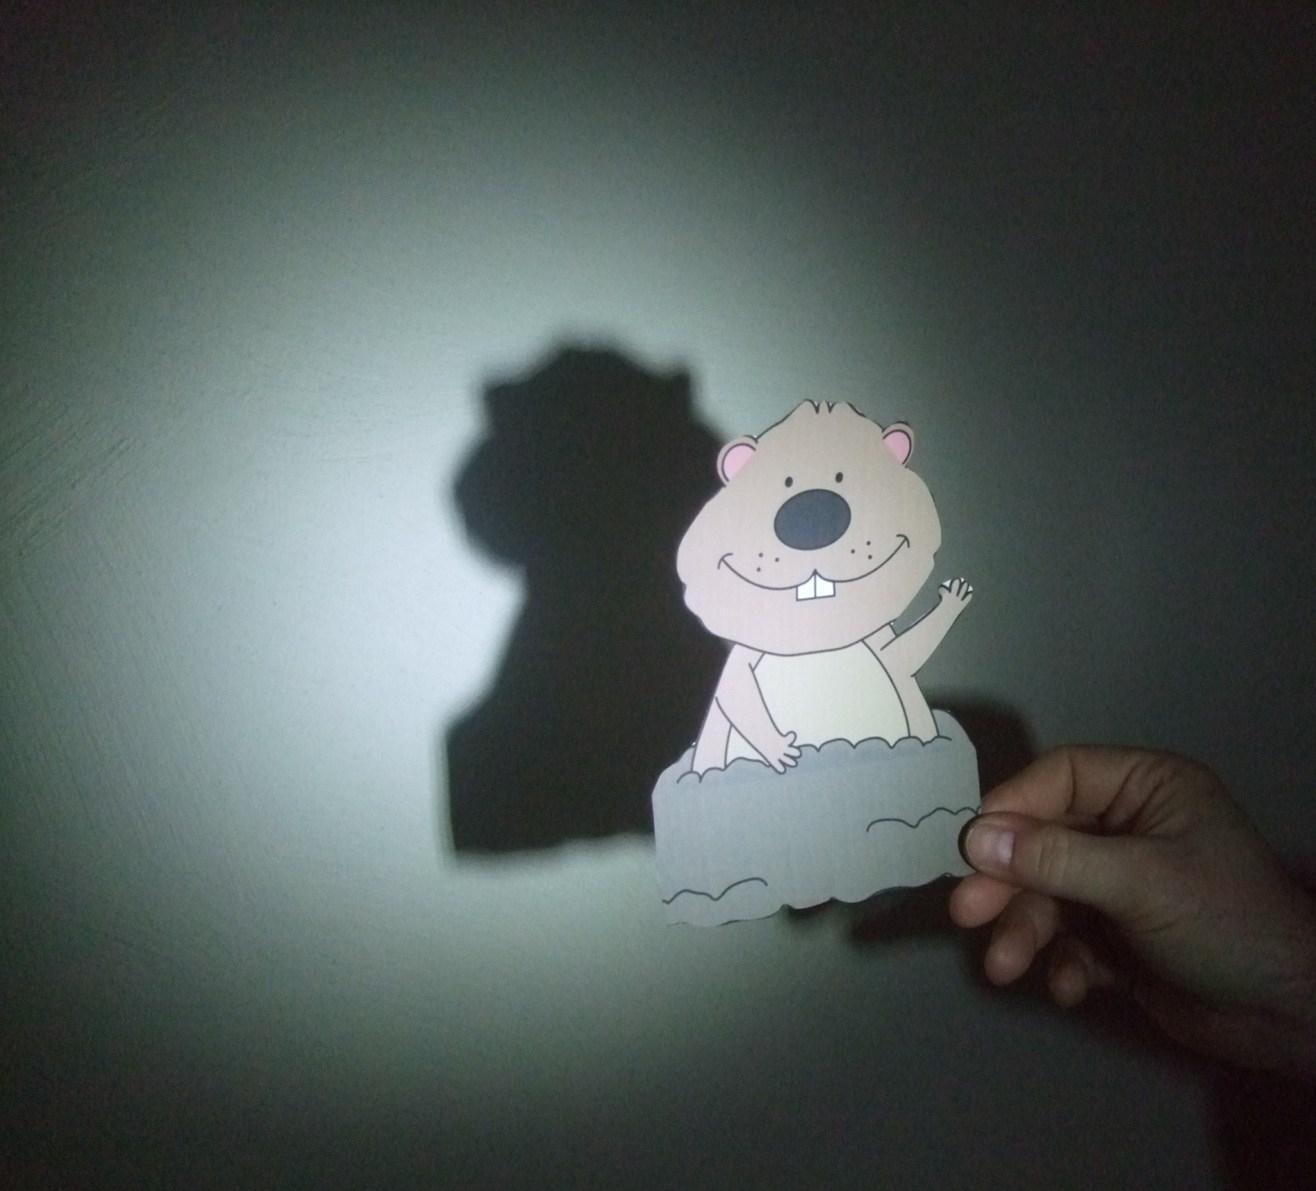 medium resolution of Groundhog Day Activities (shadow experiments